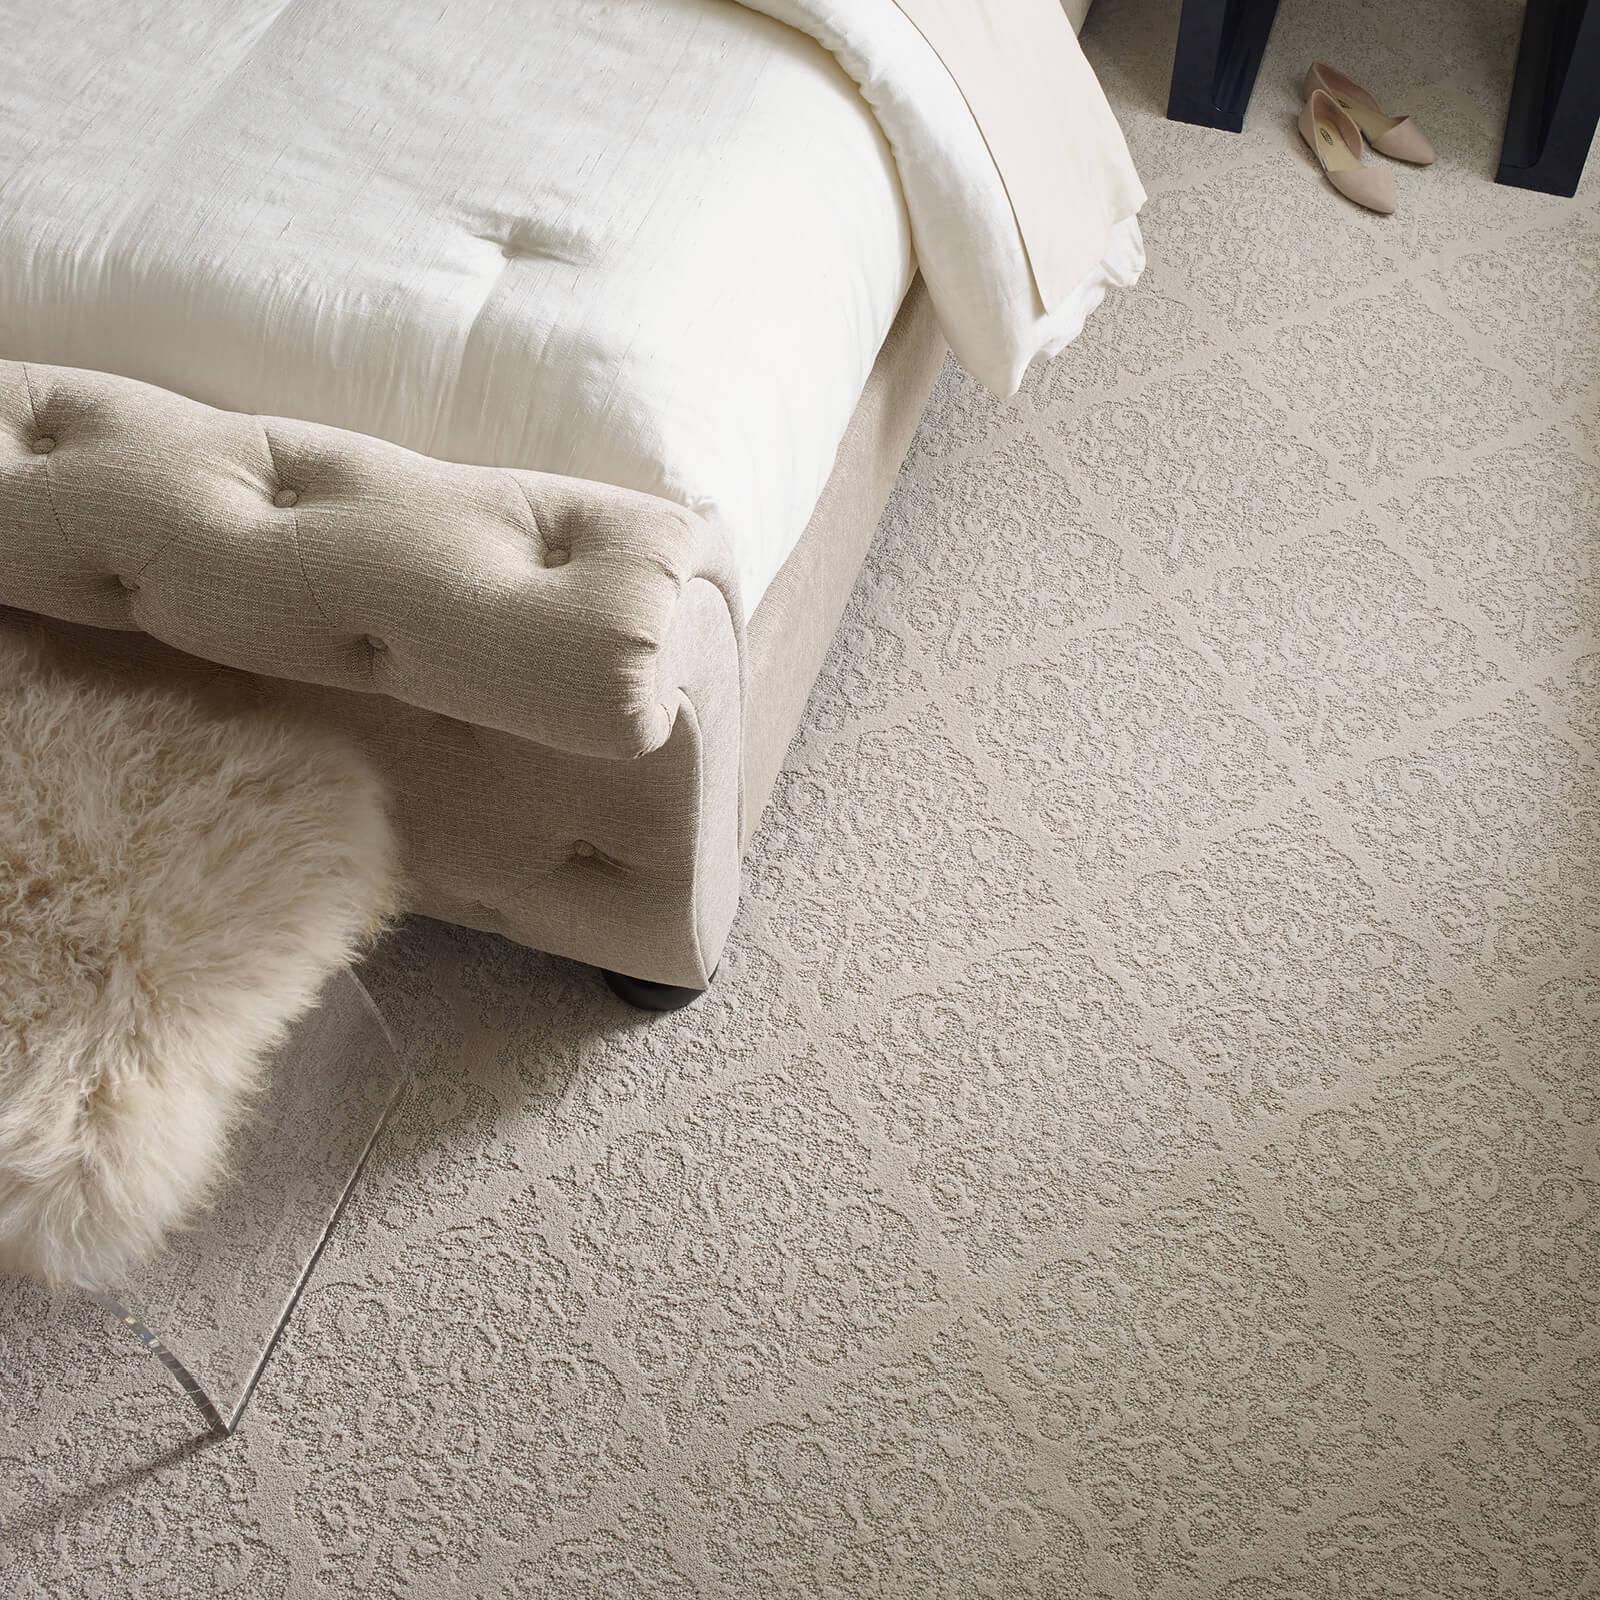 Chateau Fare | Noble Floors LLC